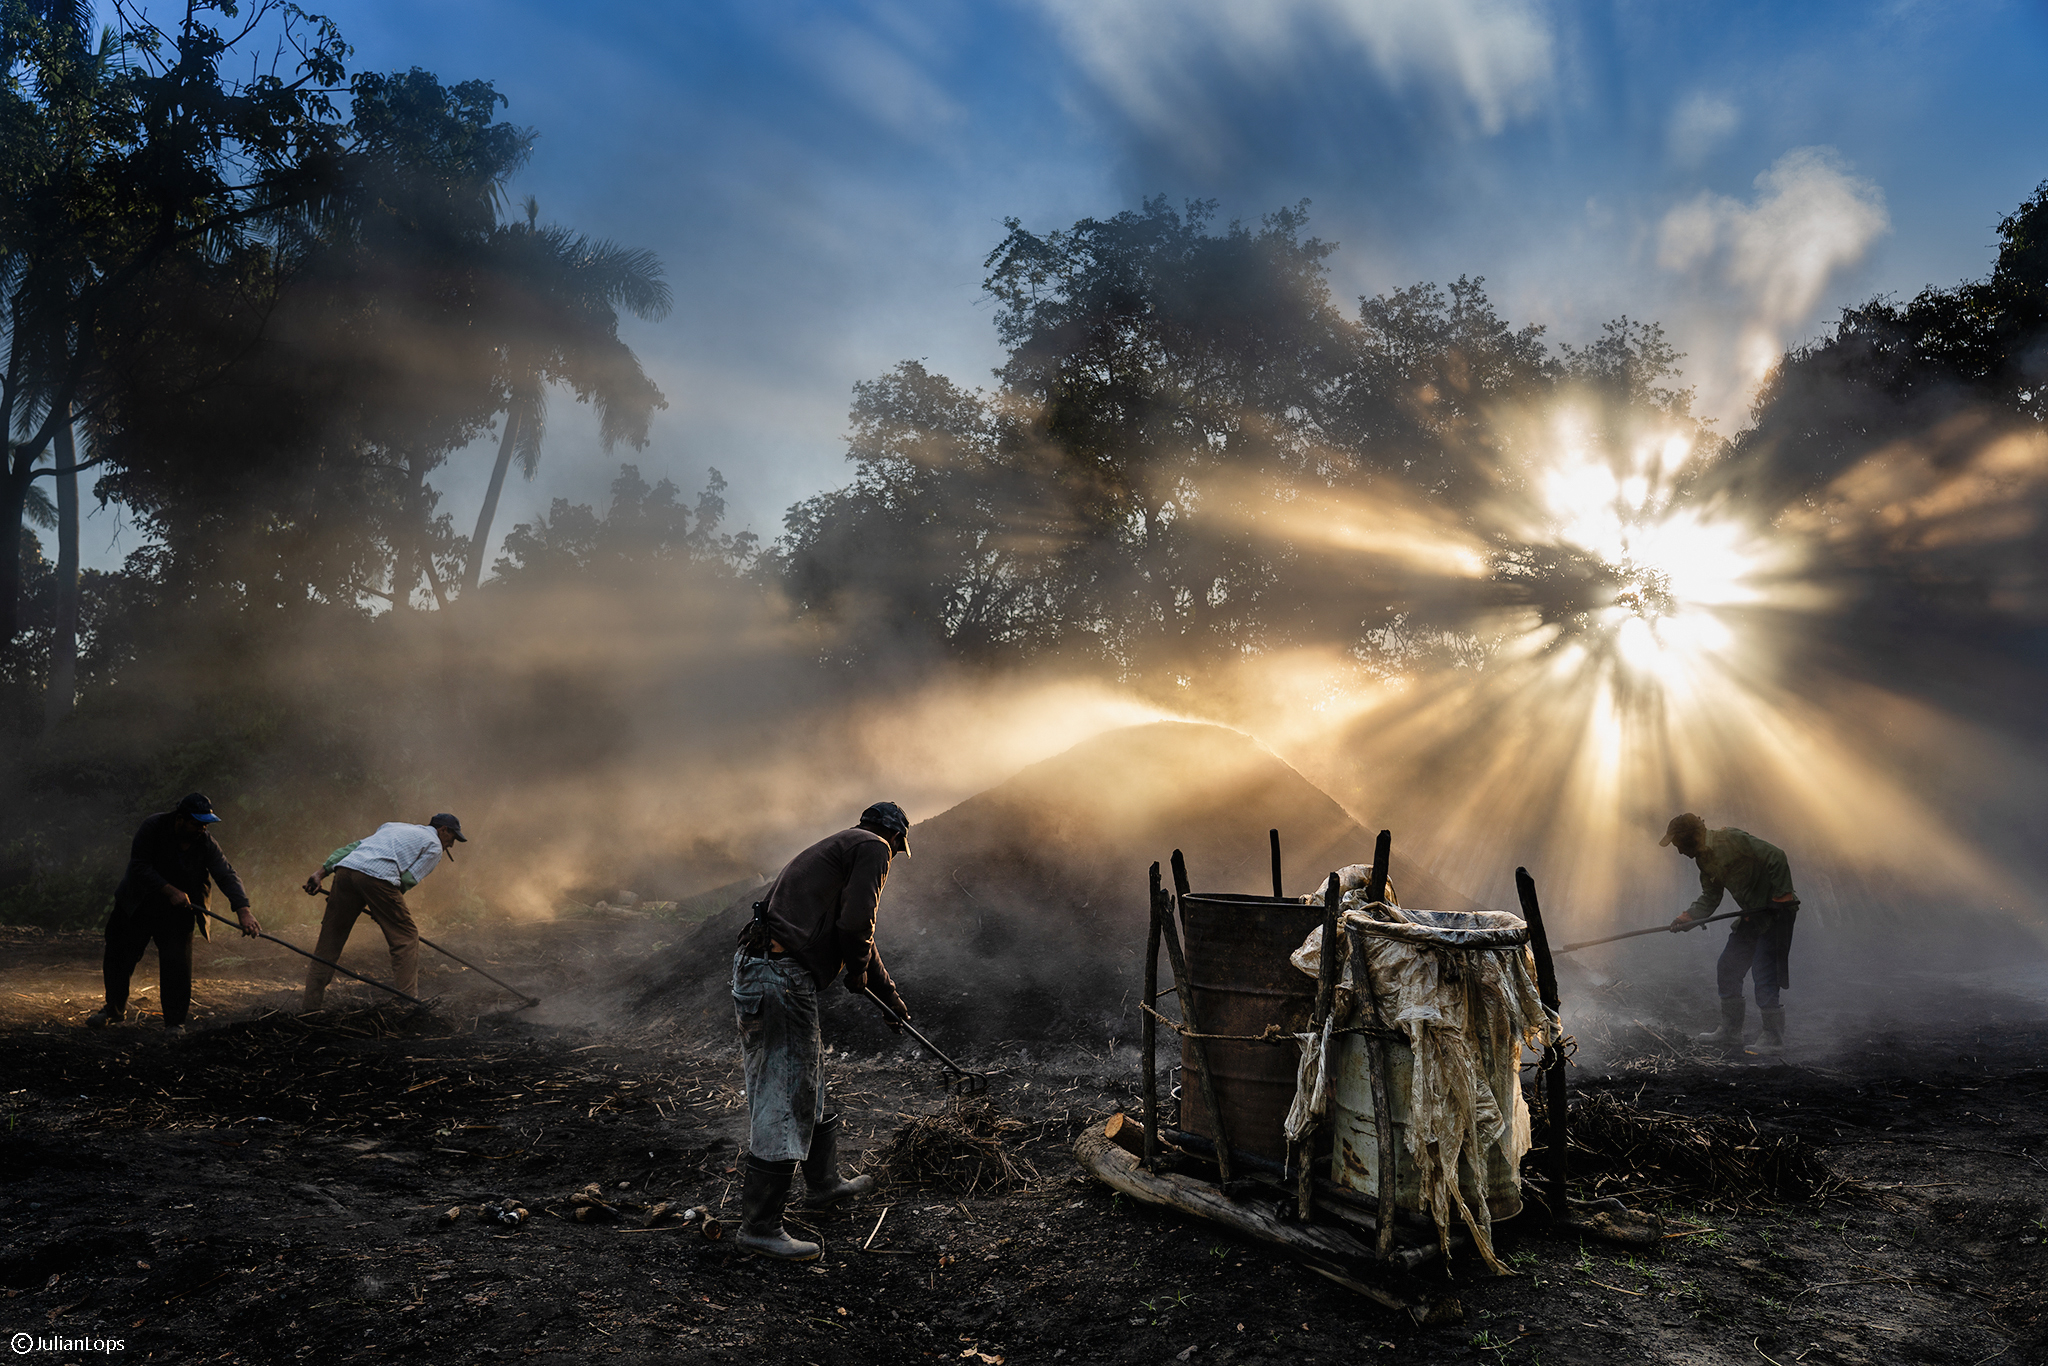 The coal men of sunrise...